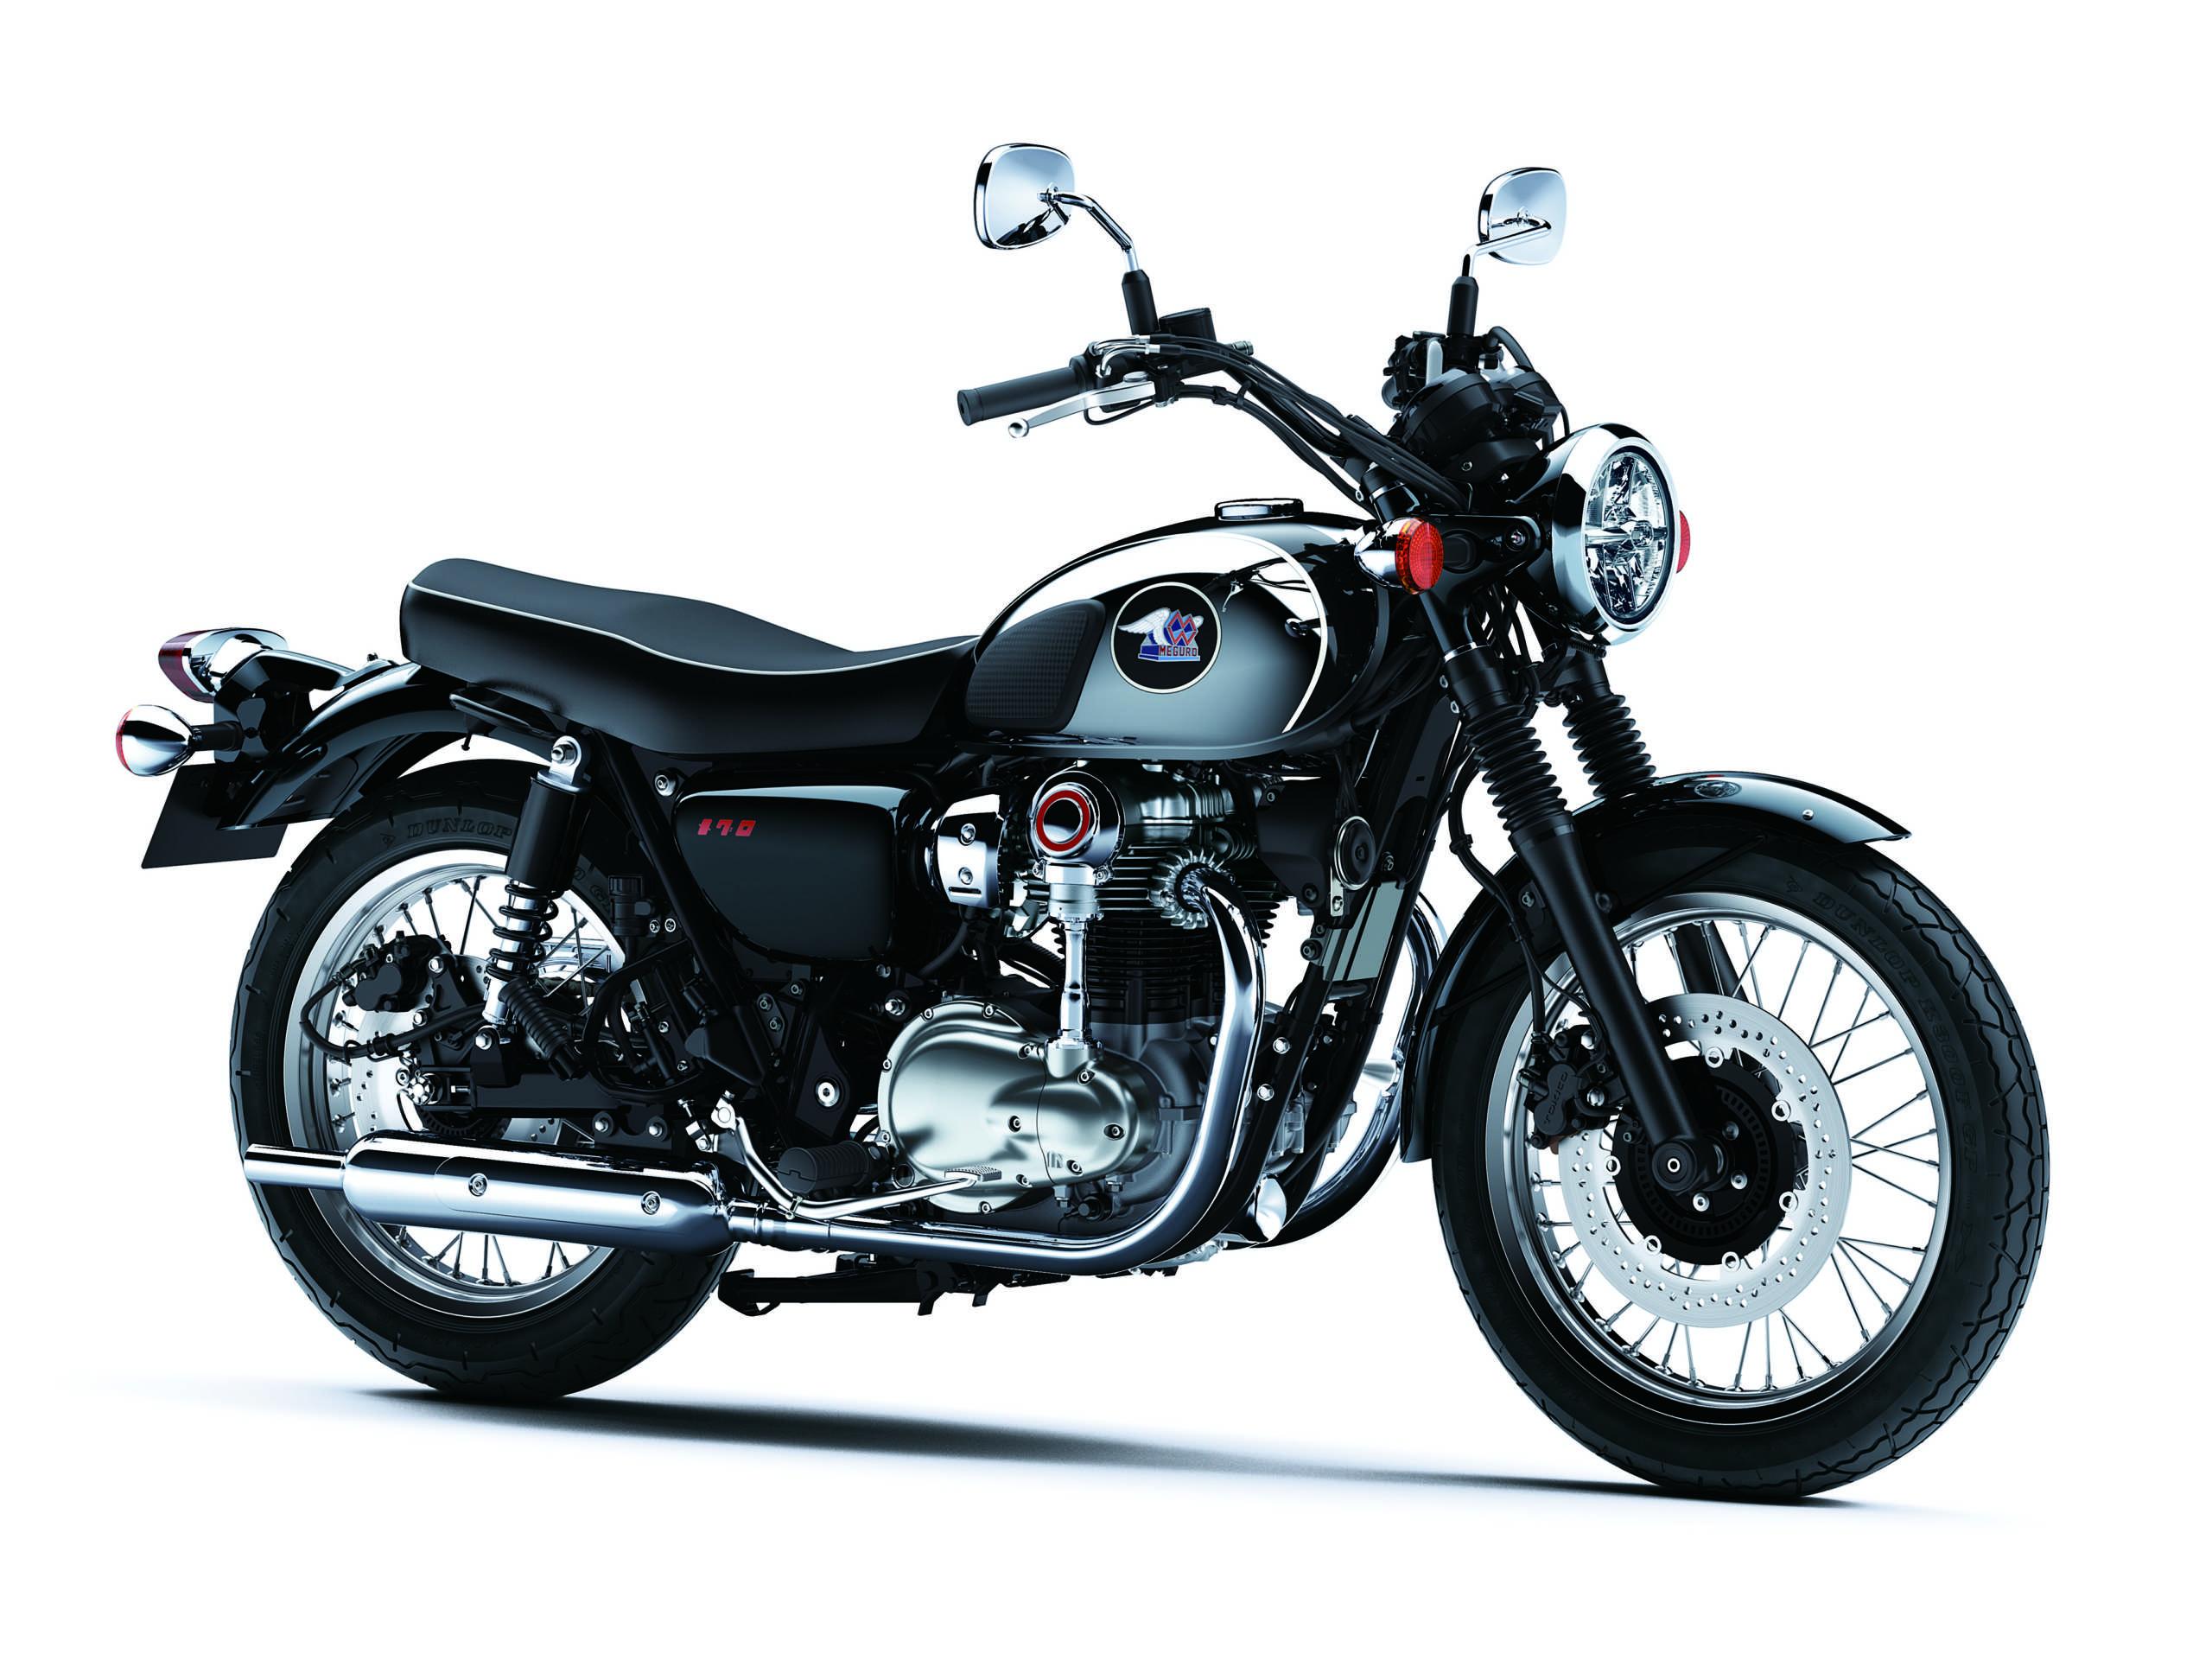 Kawasaki(カワサキ)次はメグロだ! MEGURO K3発売!